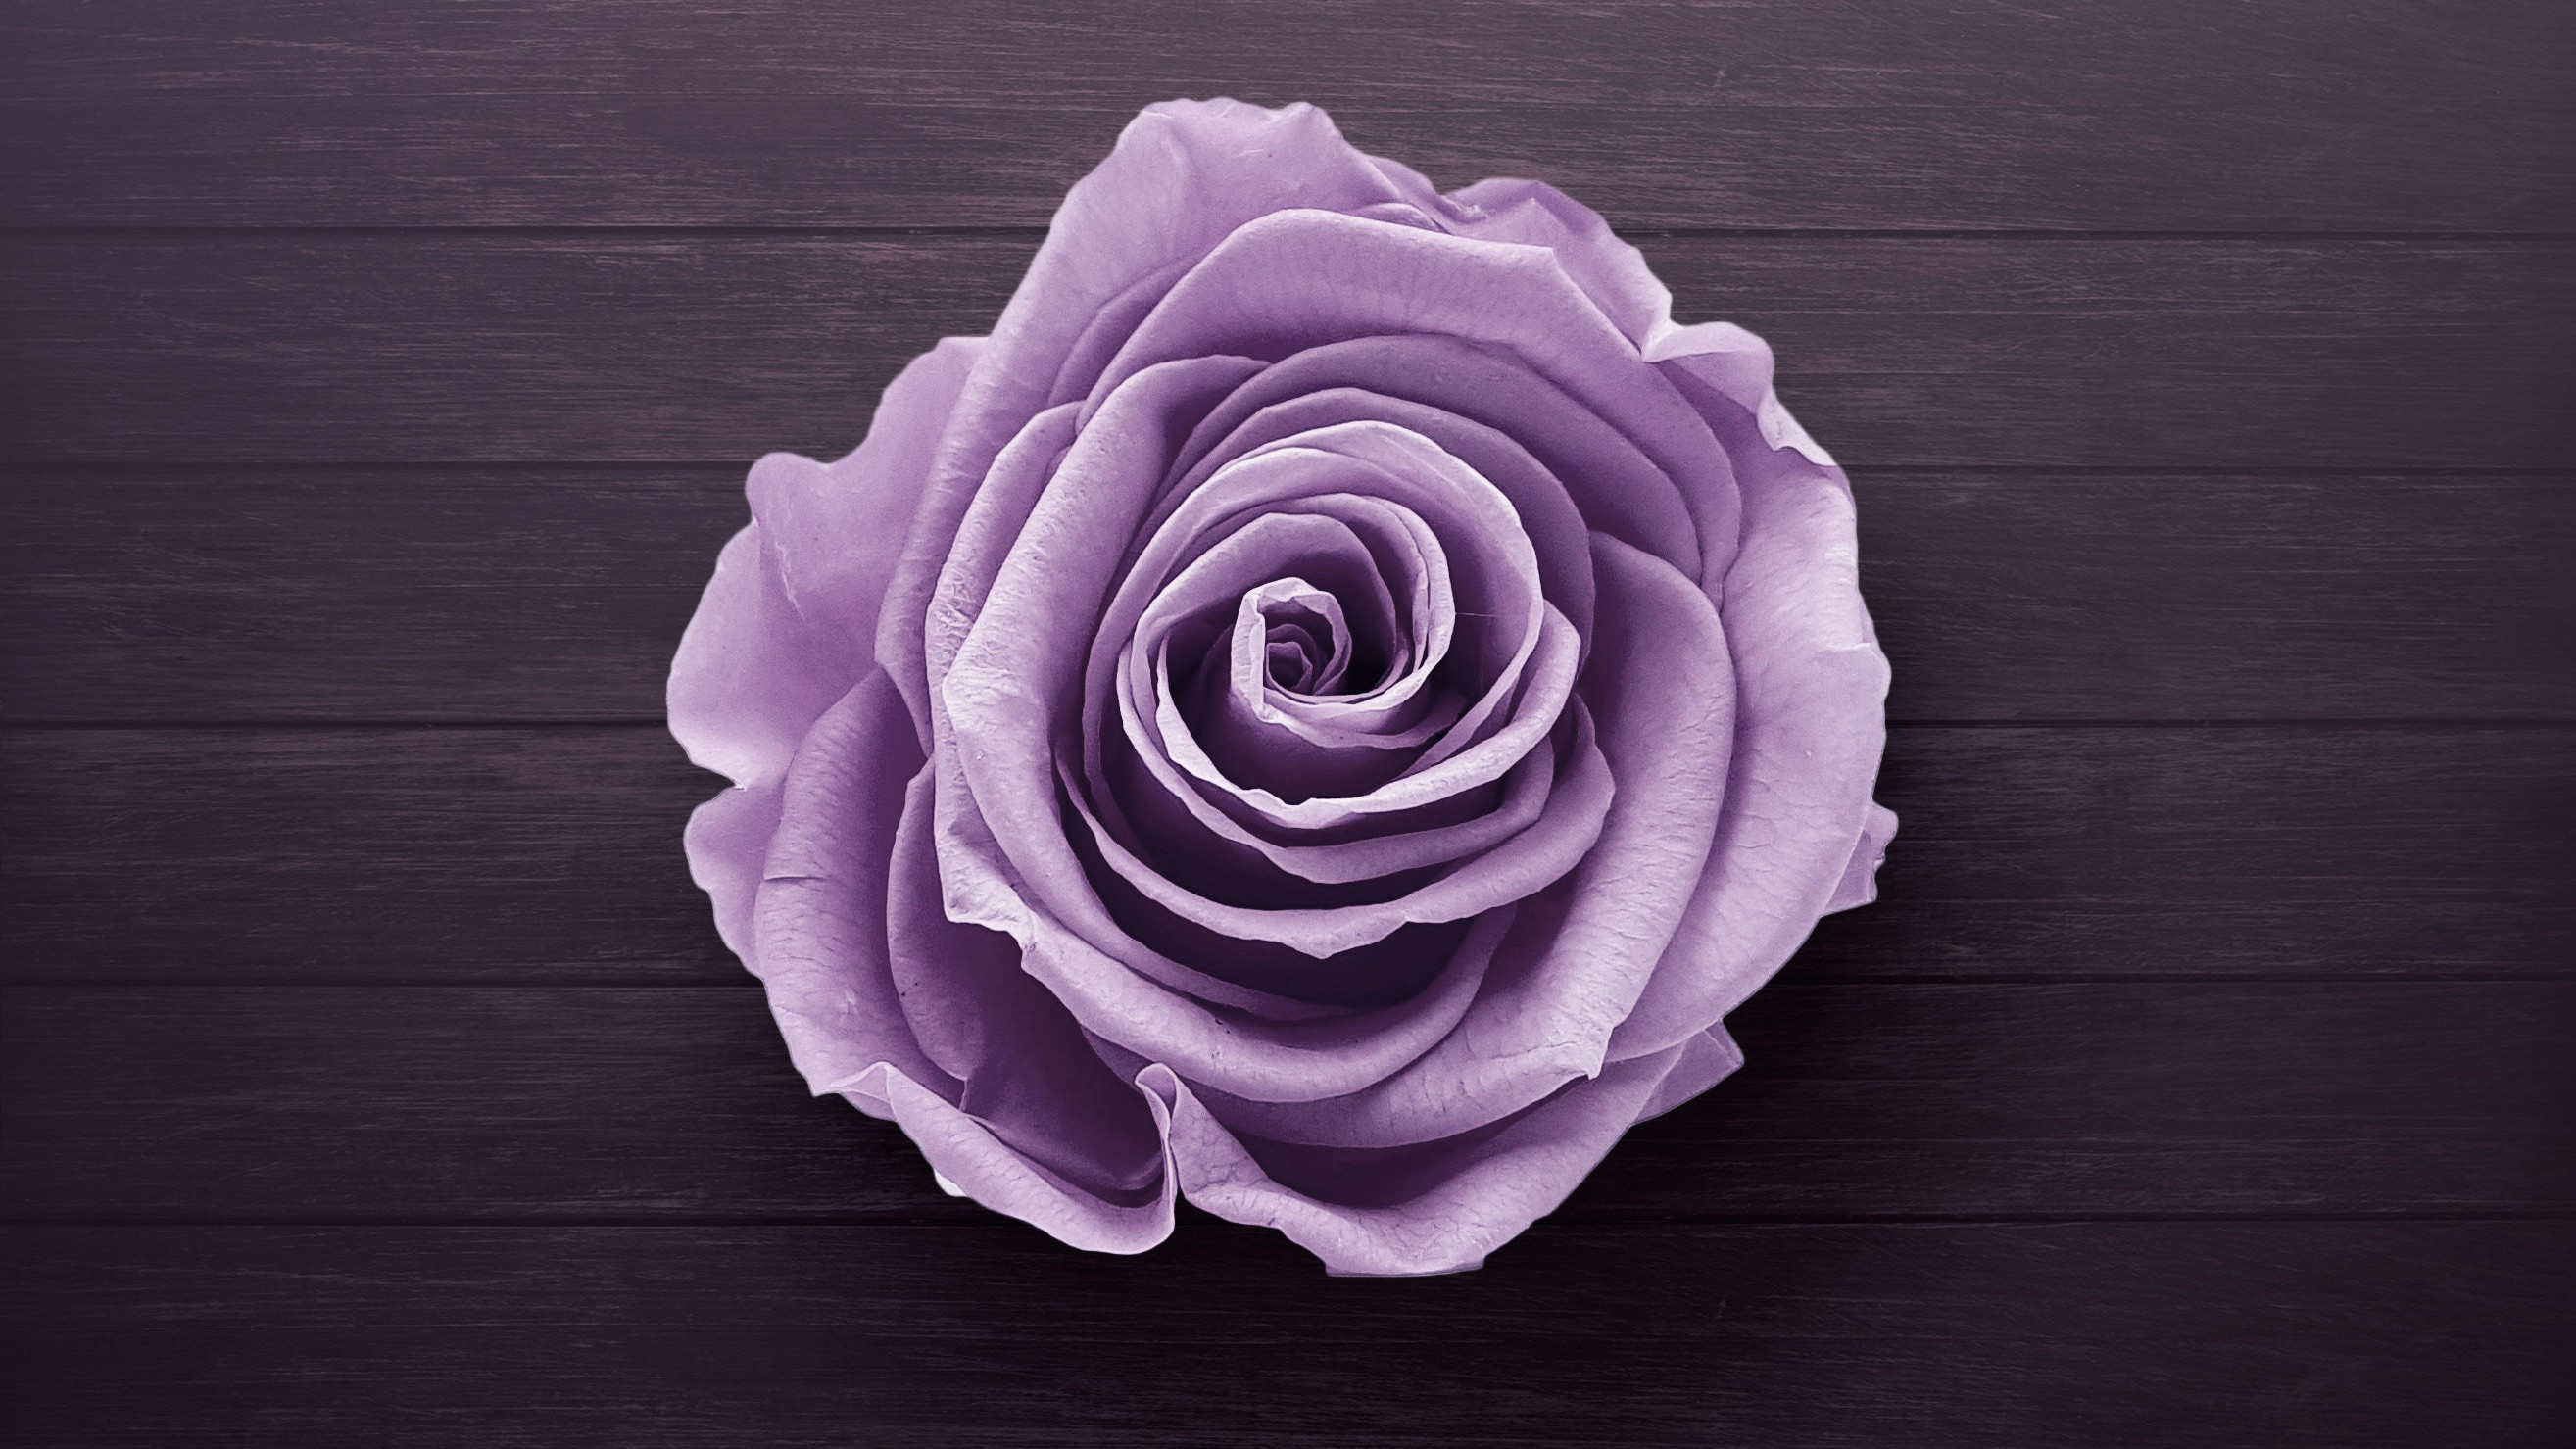 Res: 2629x1479, #rose, #flowers, #hd, #purple